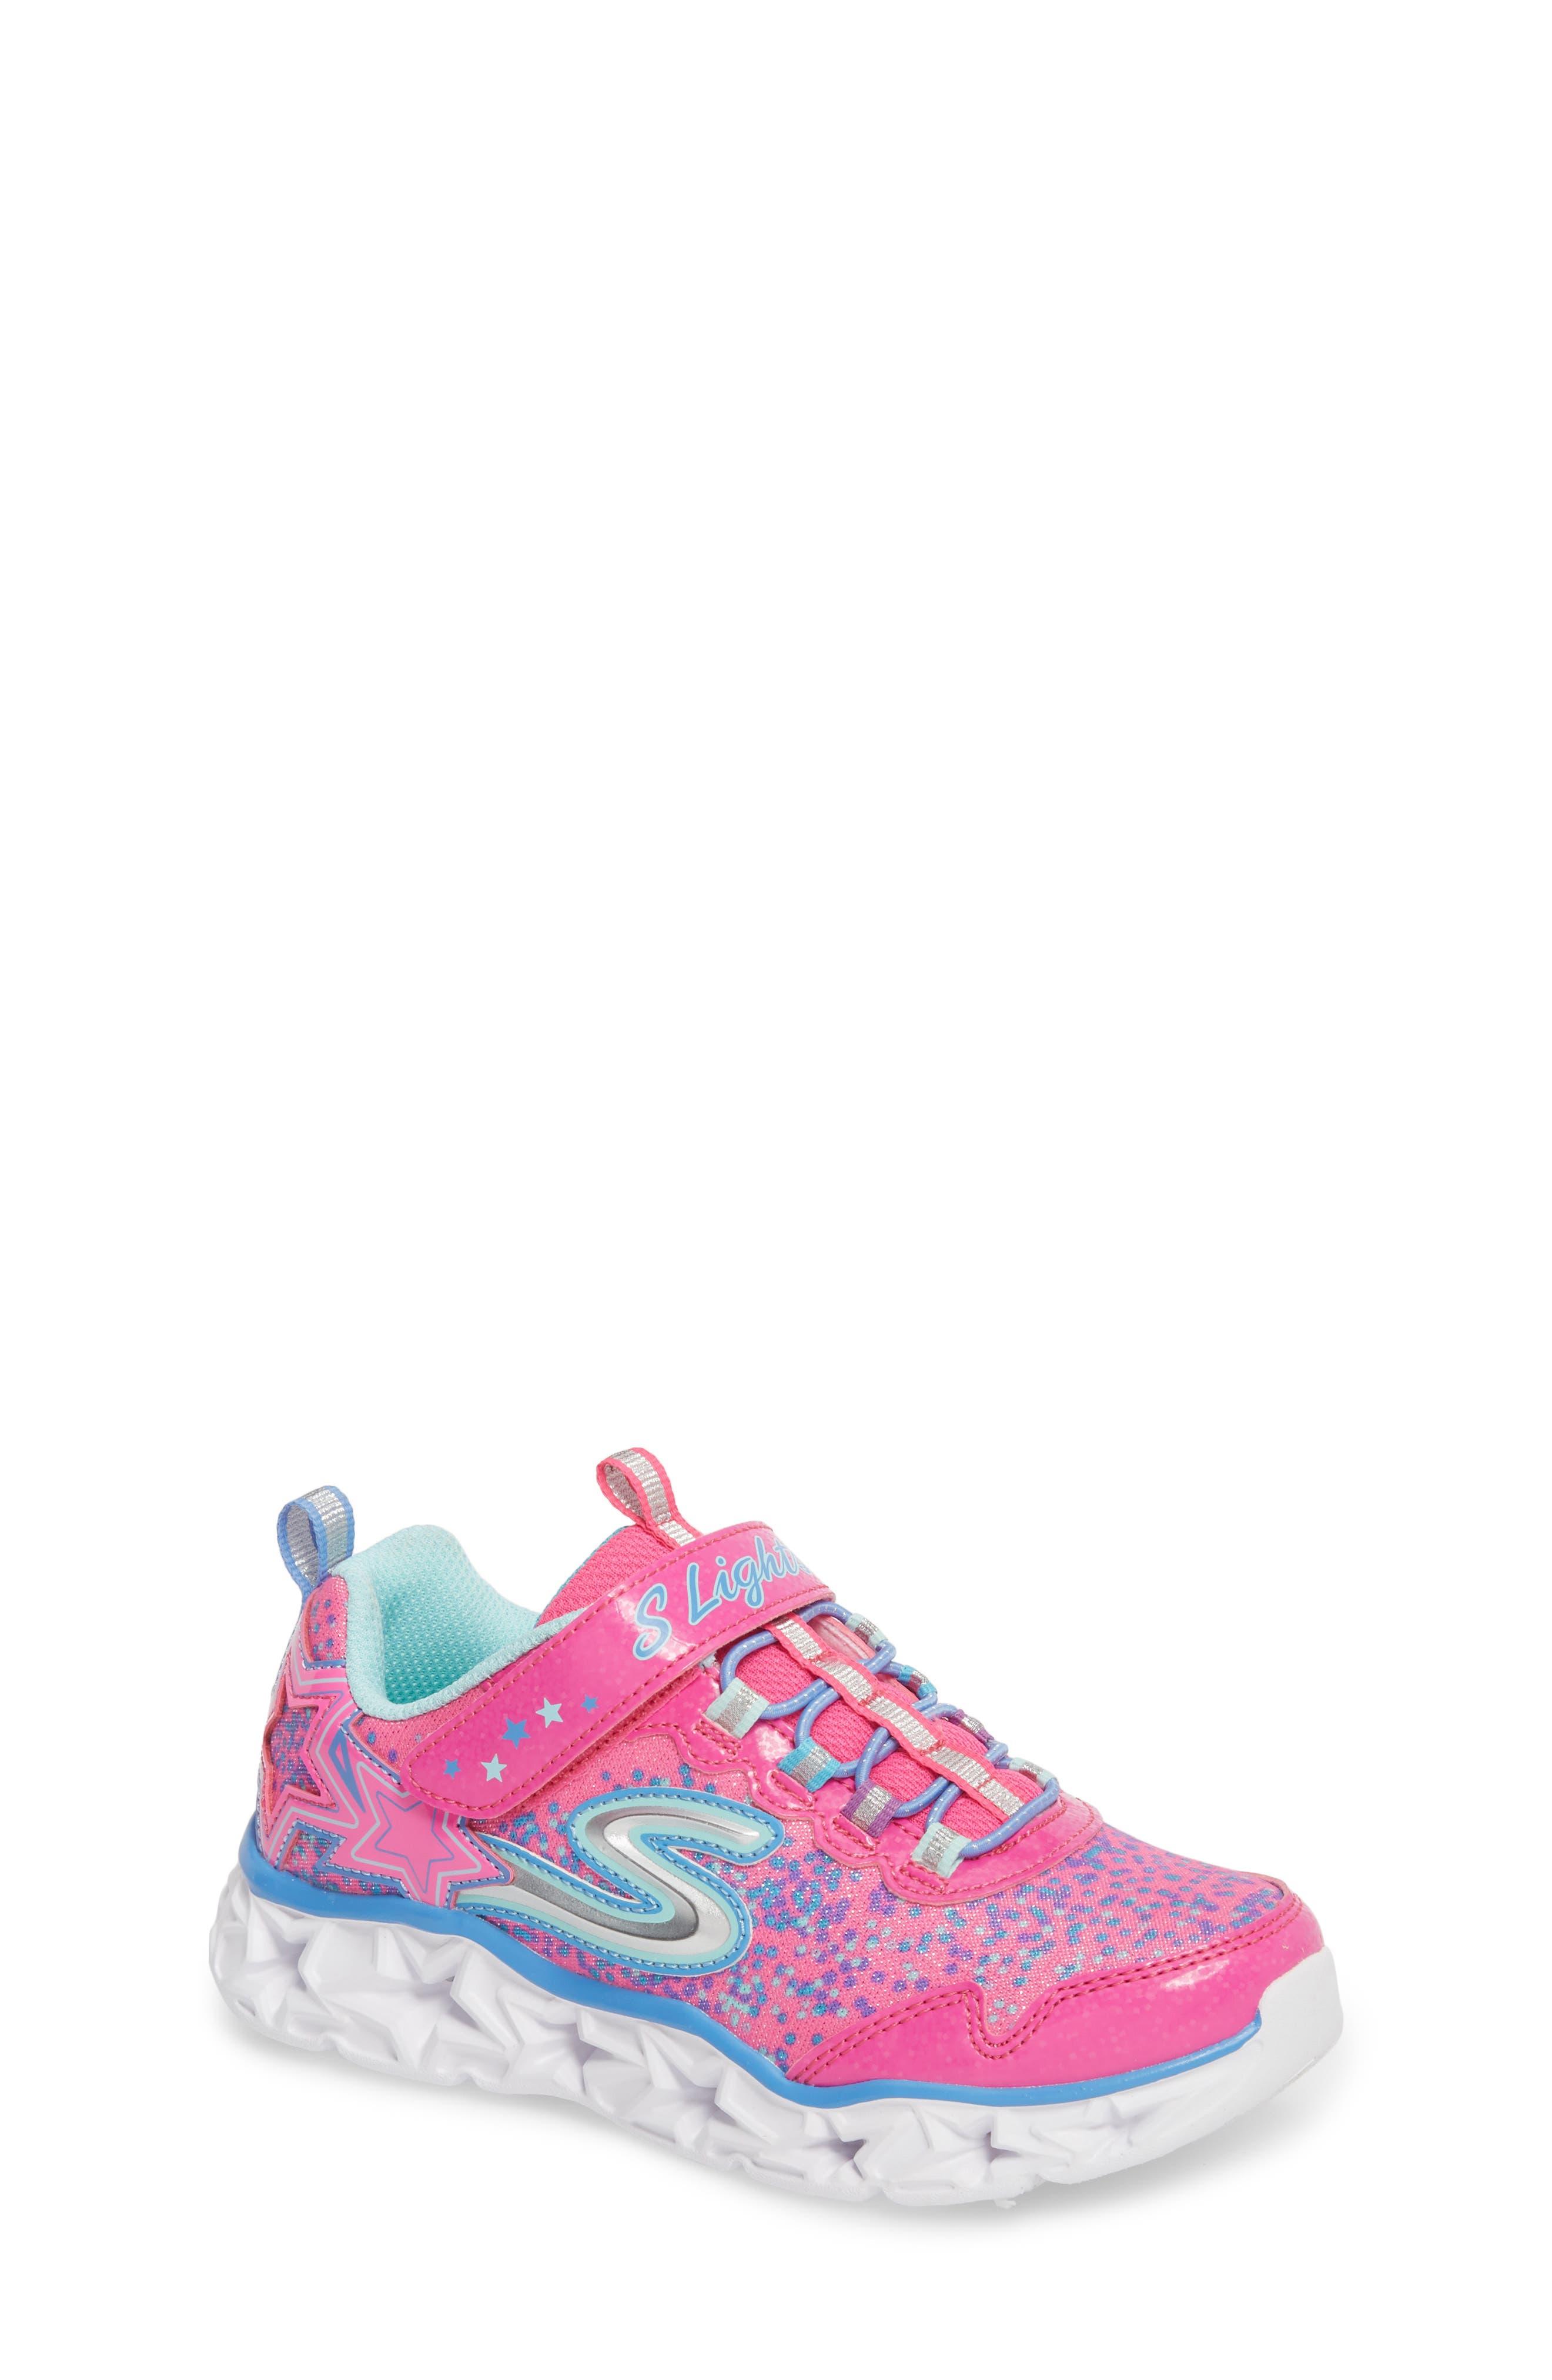 Galaxy Lights Sneakers,                             Main thumbnail 1, color,                             650